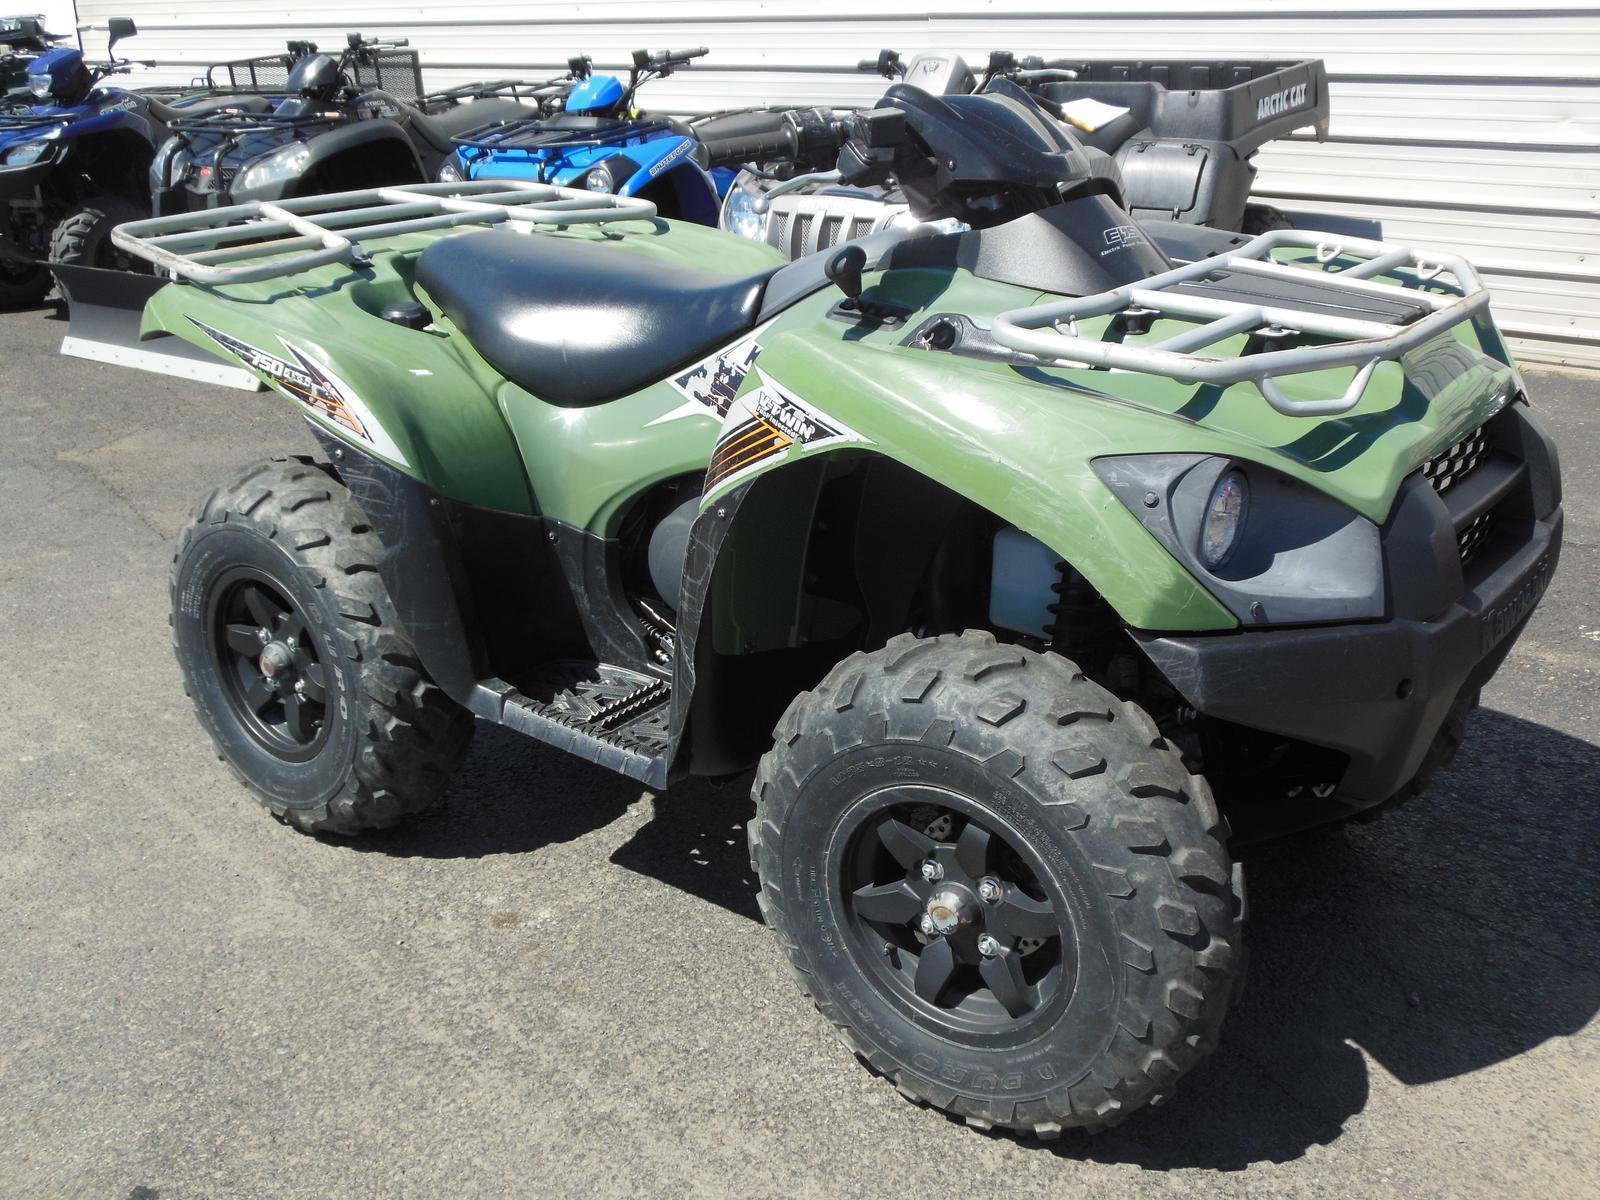 2012 Kawasaki Brute Force® 750 4x4i EPS for sale in Bridgeport, WV